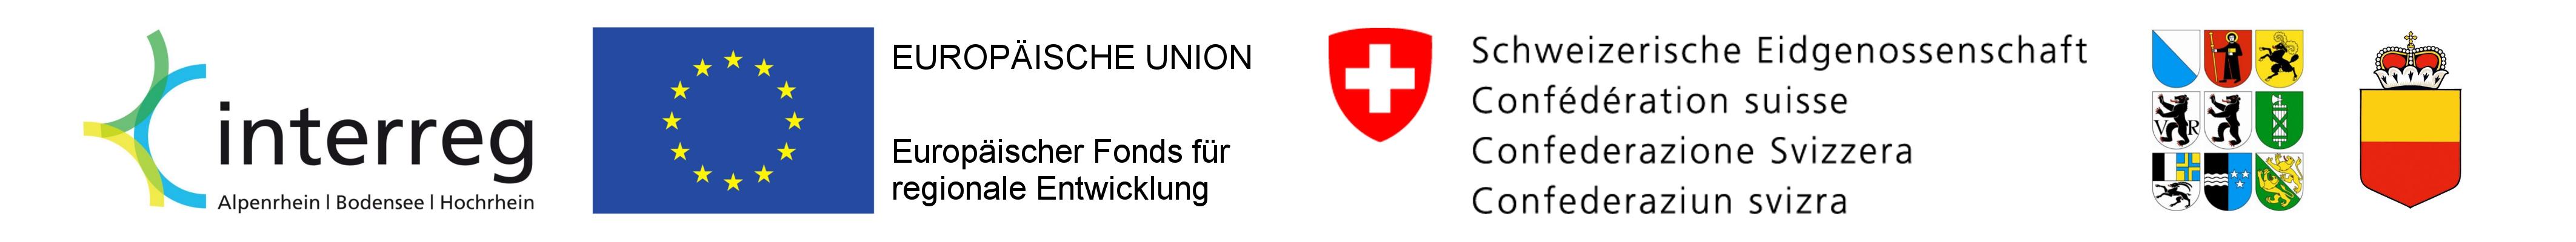 01-leiste-interreg-eu-ch-ch-kantone-fl